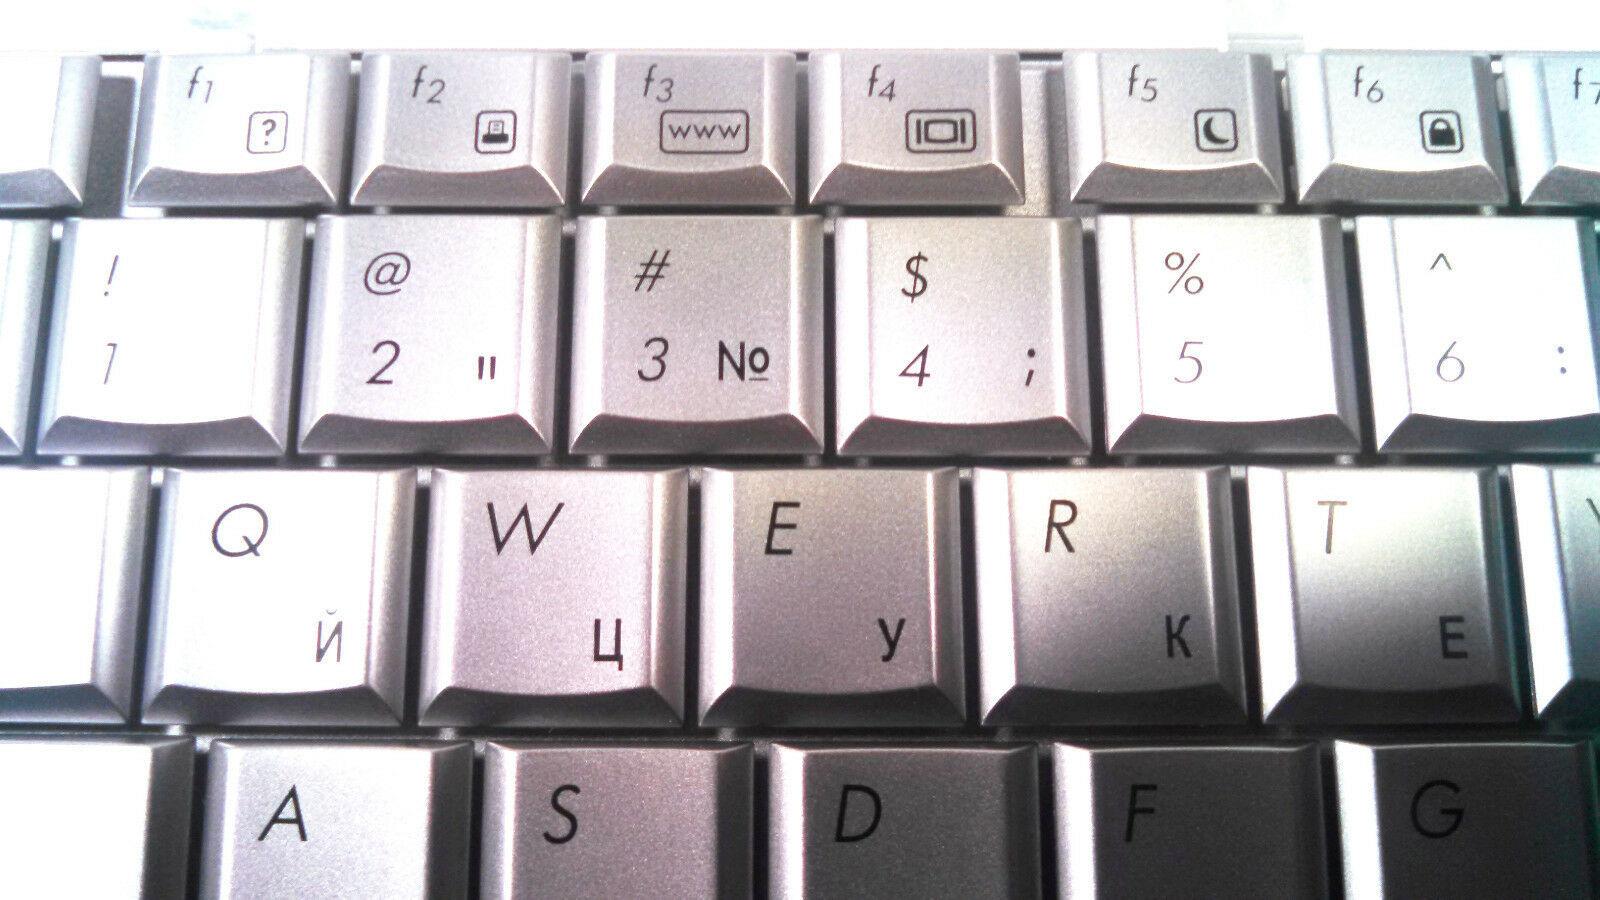 New OEM HP Pavillion DV5-1000 Keyboard 488590-001 US Silver